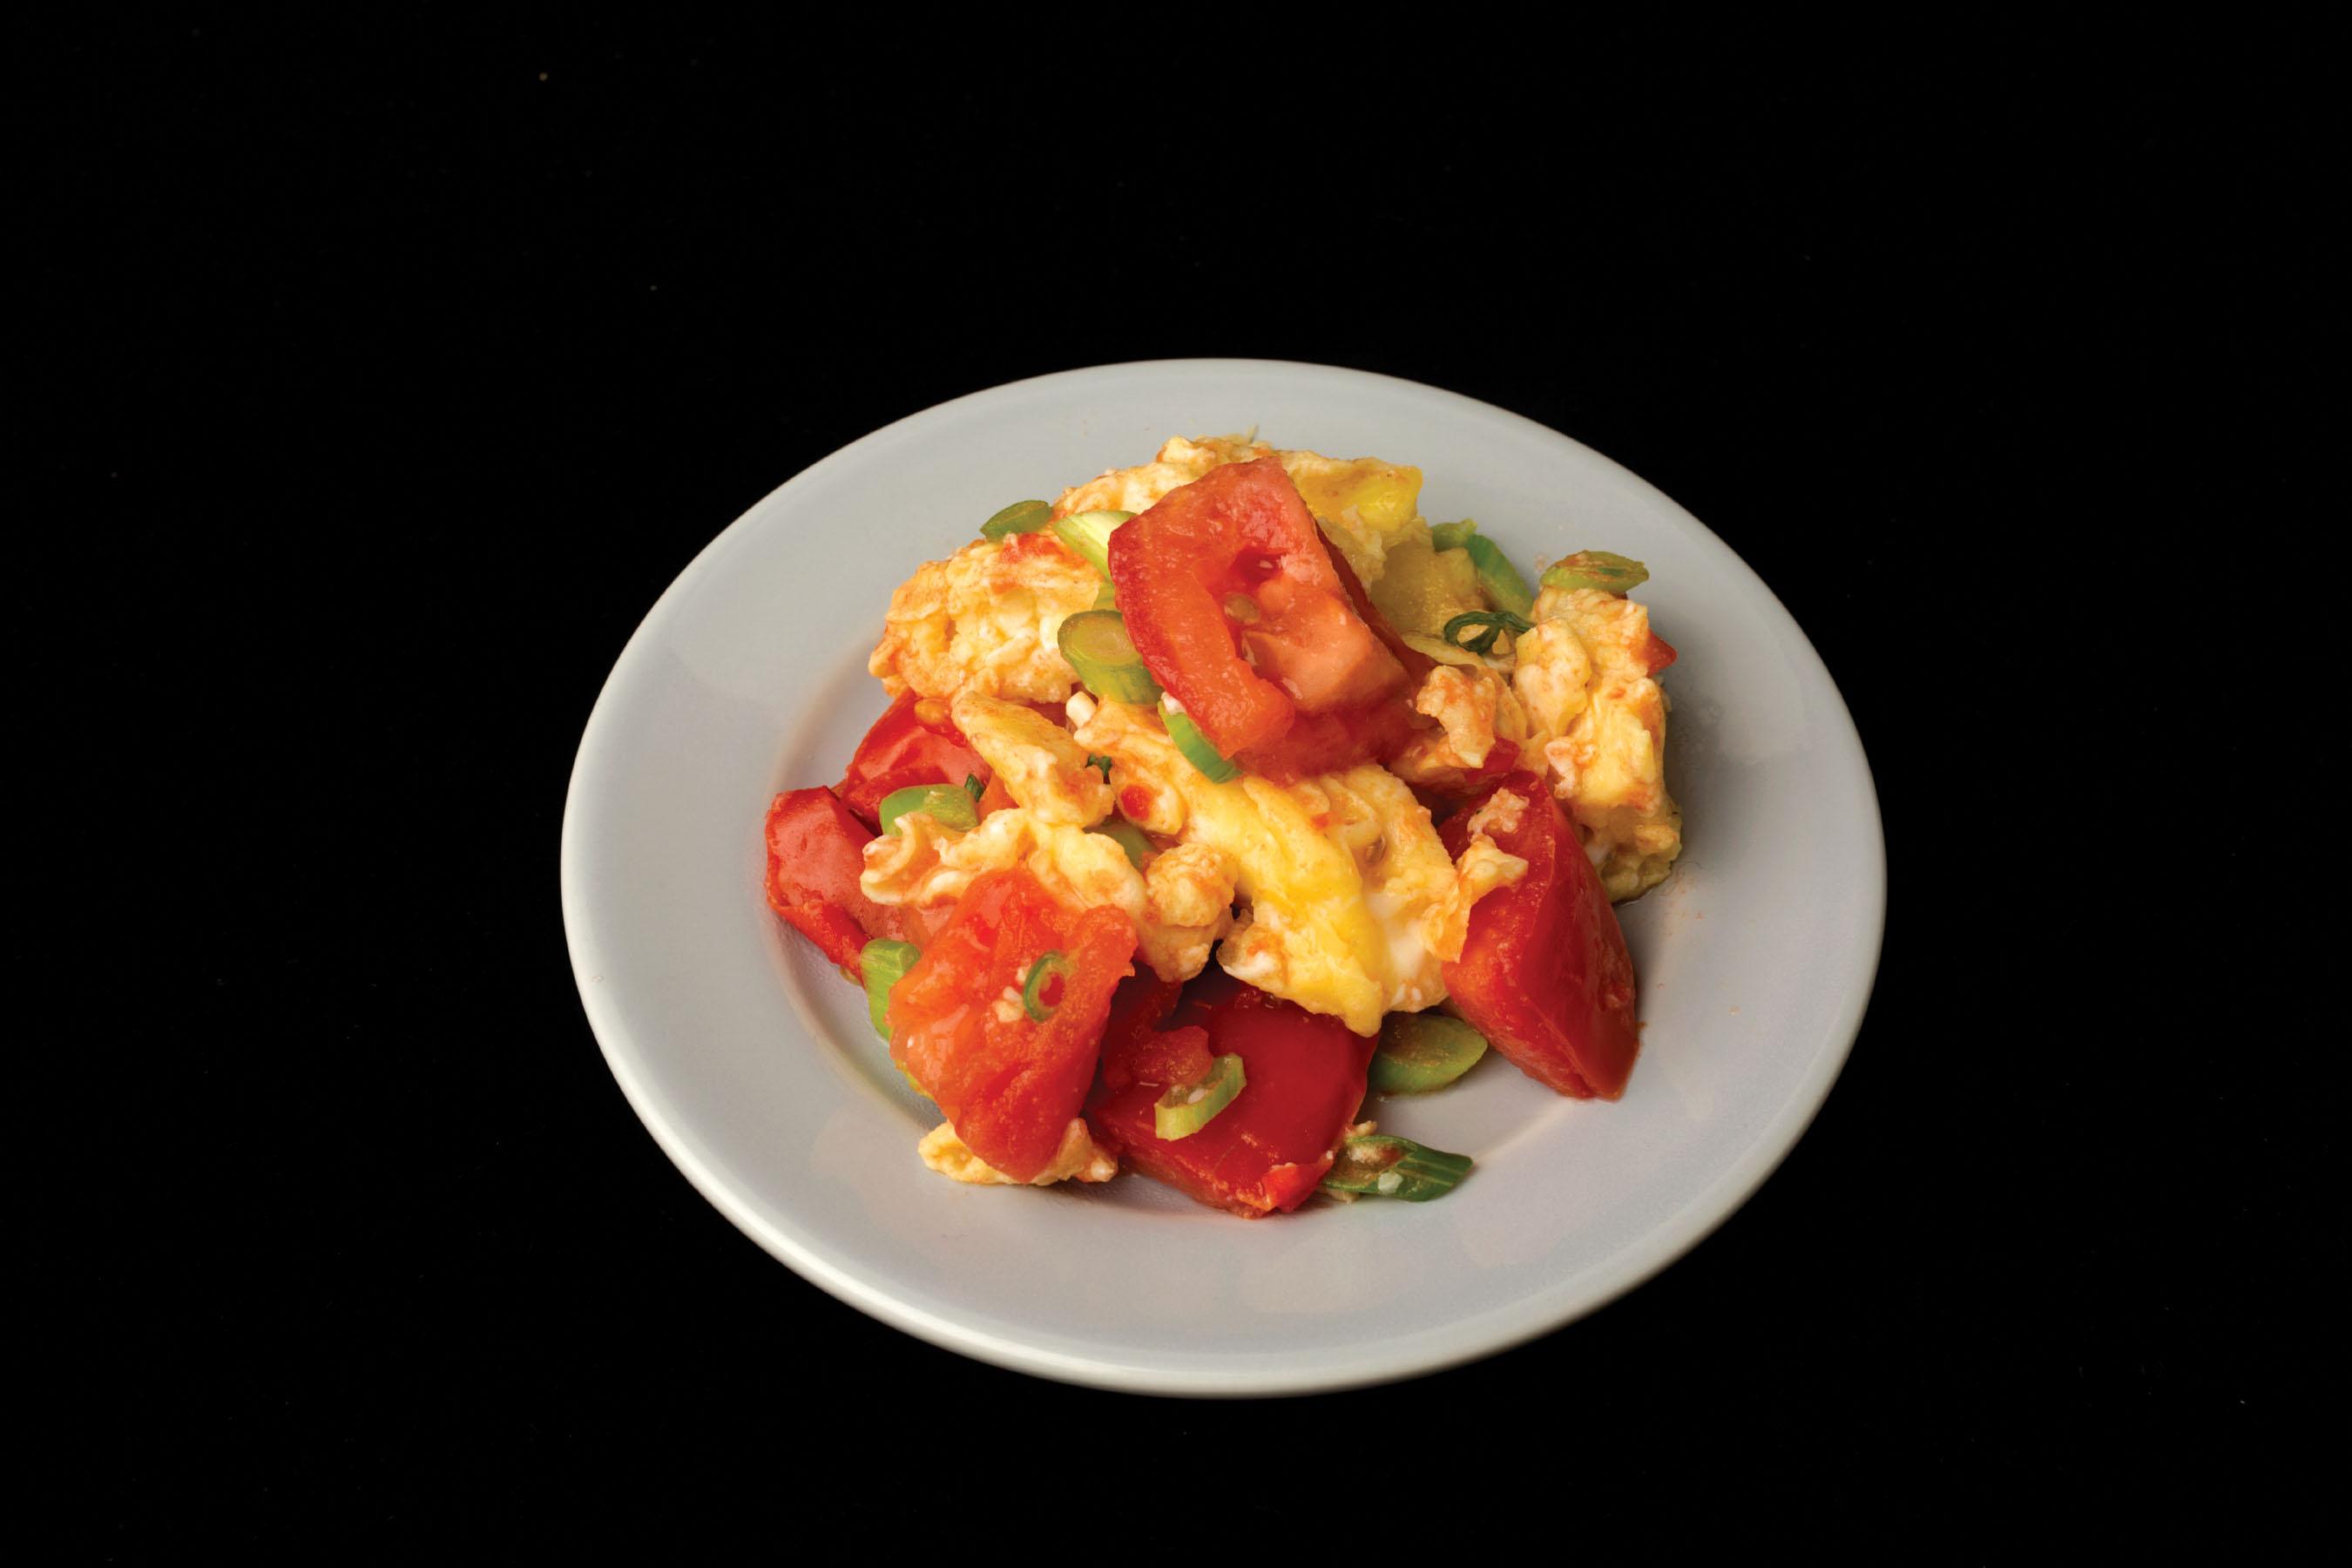 Stir-Fried Egg and Tomato